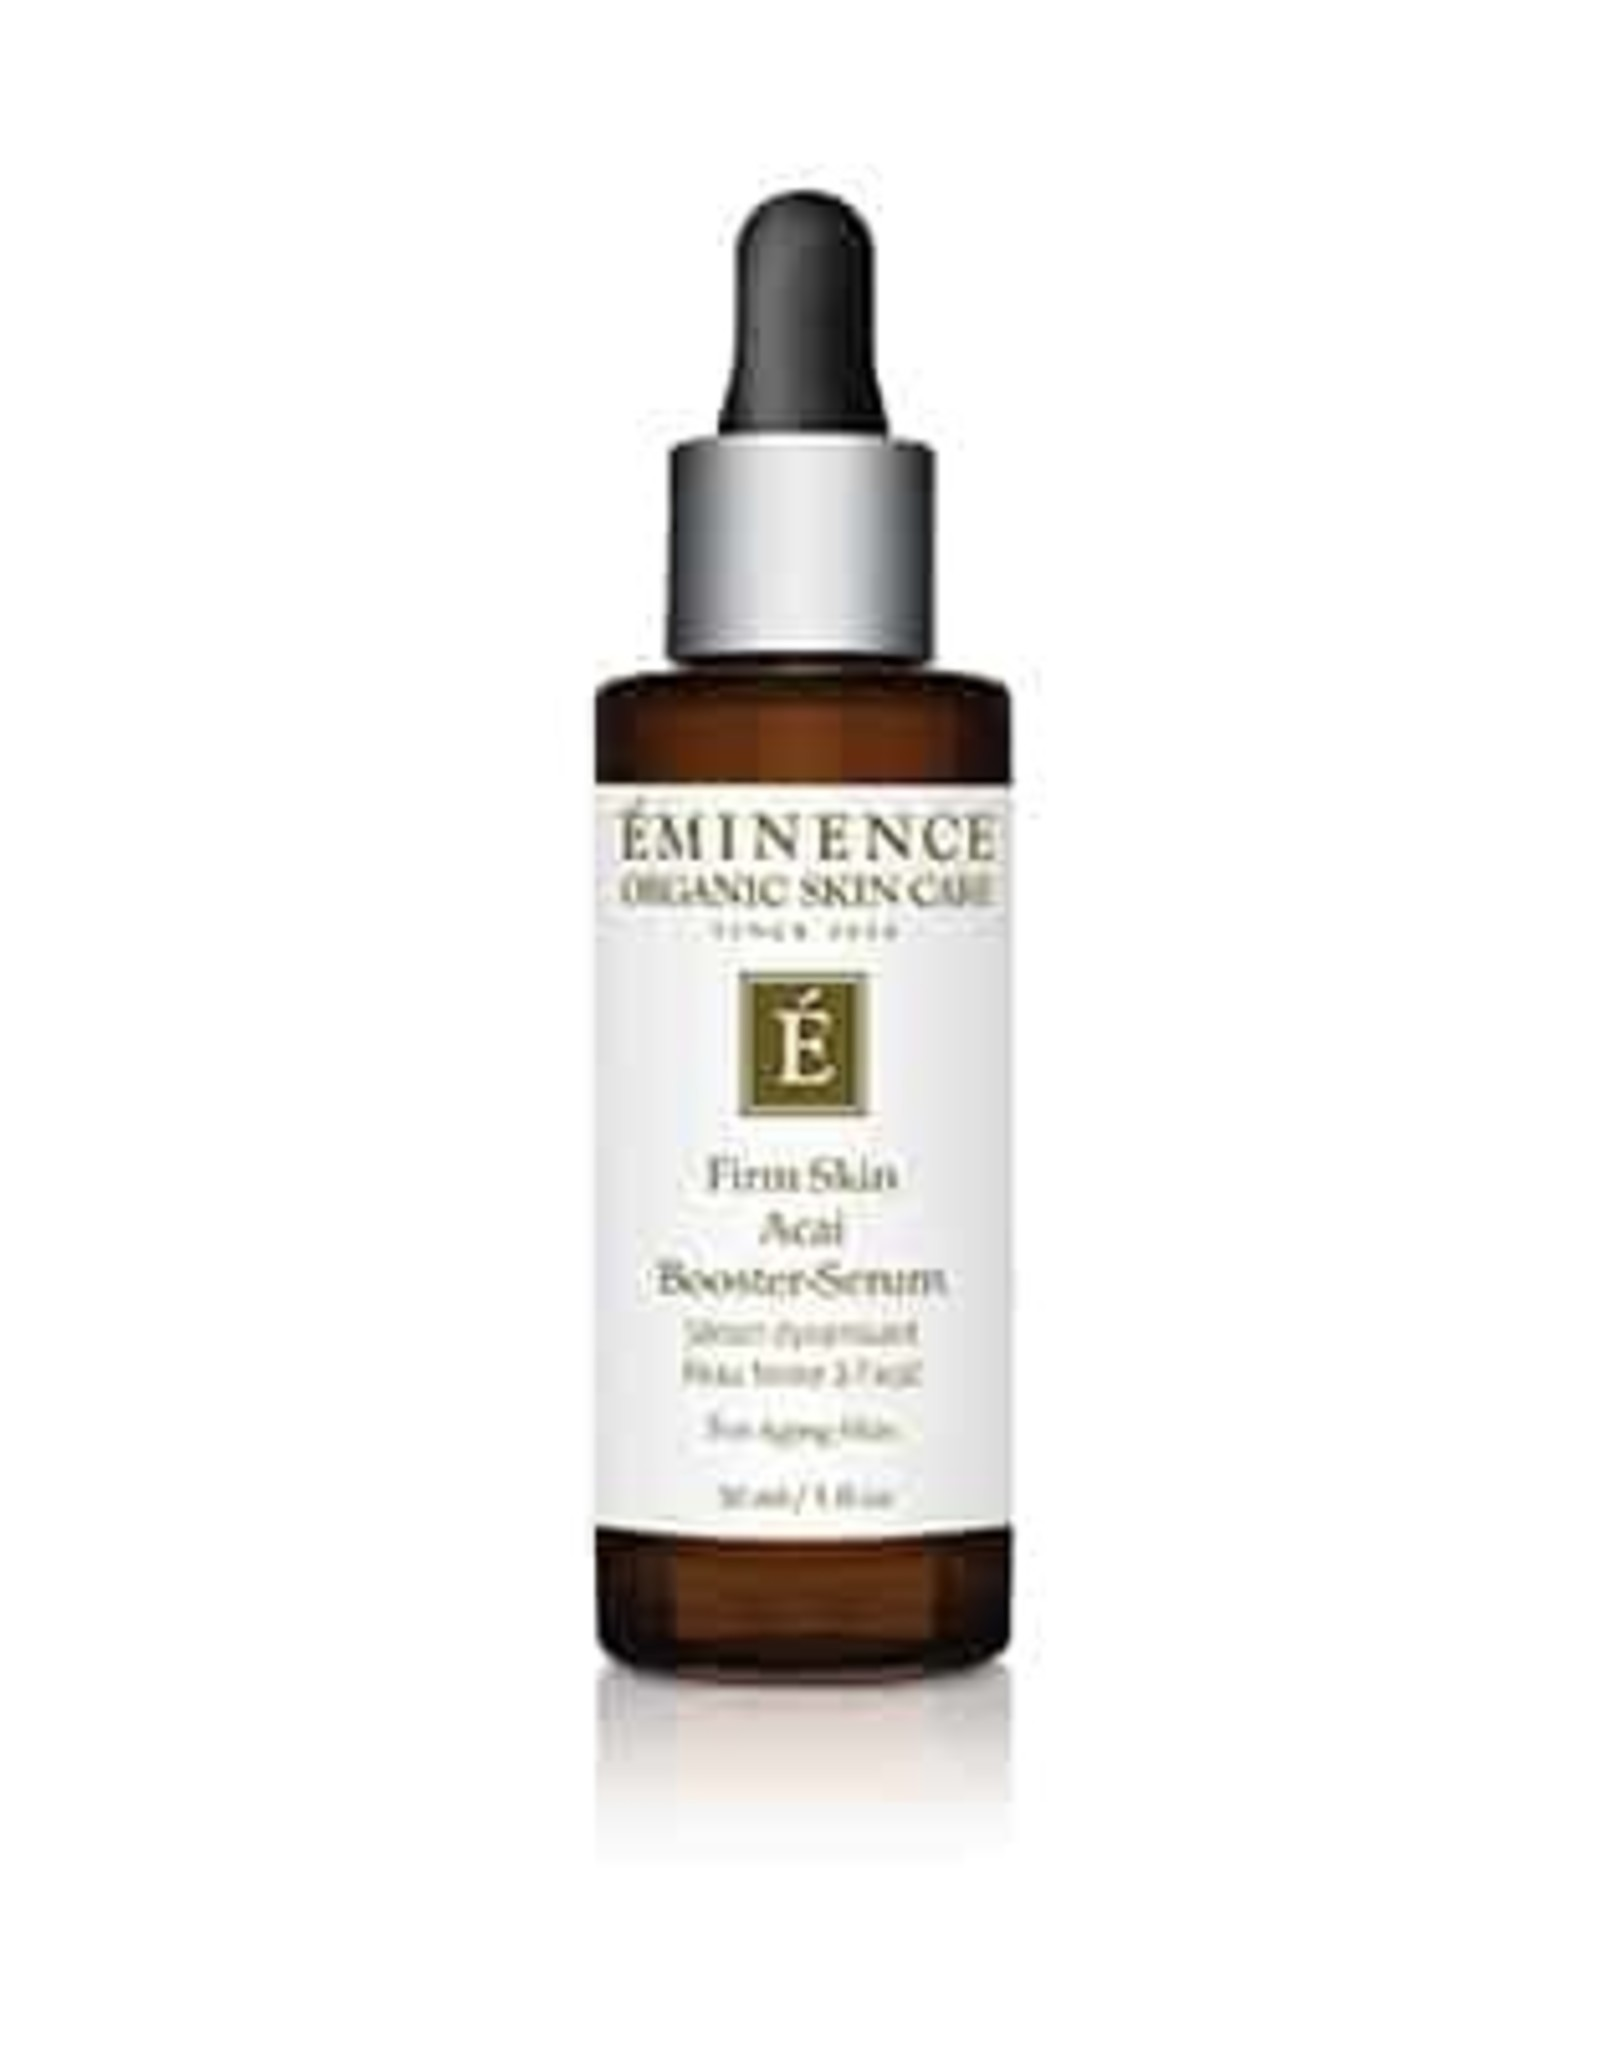 Eminence Firm Skin Acai Booster Serum